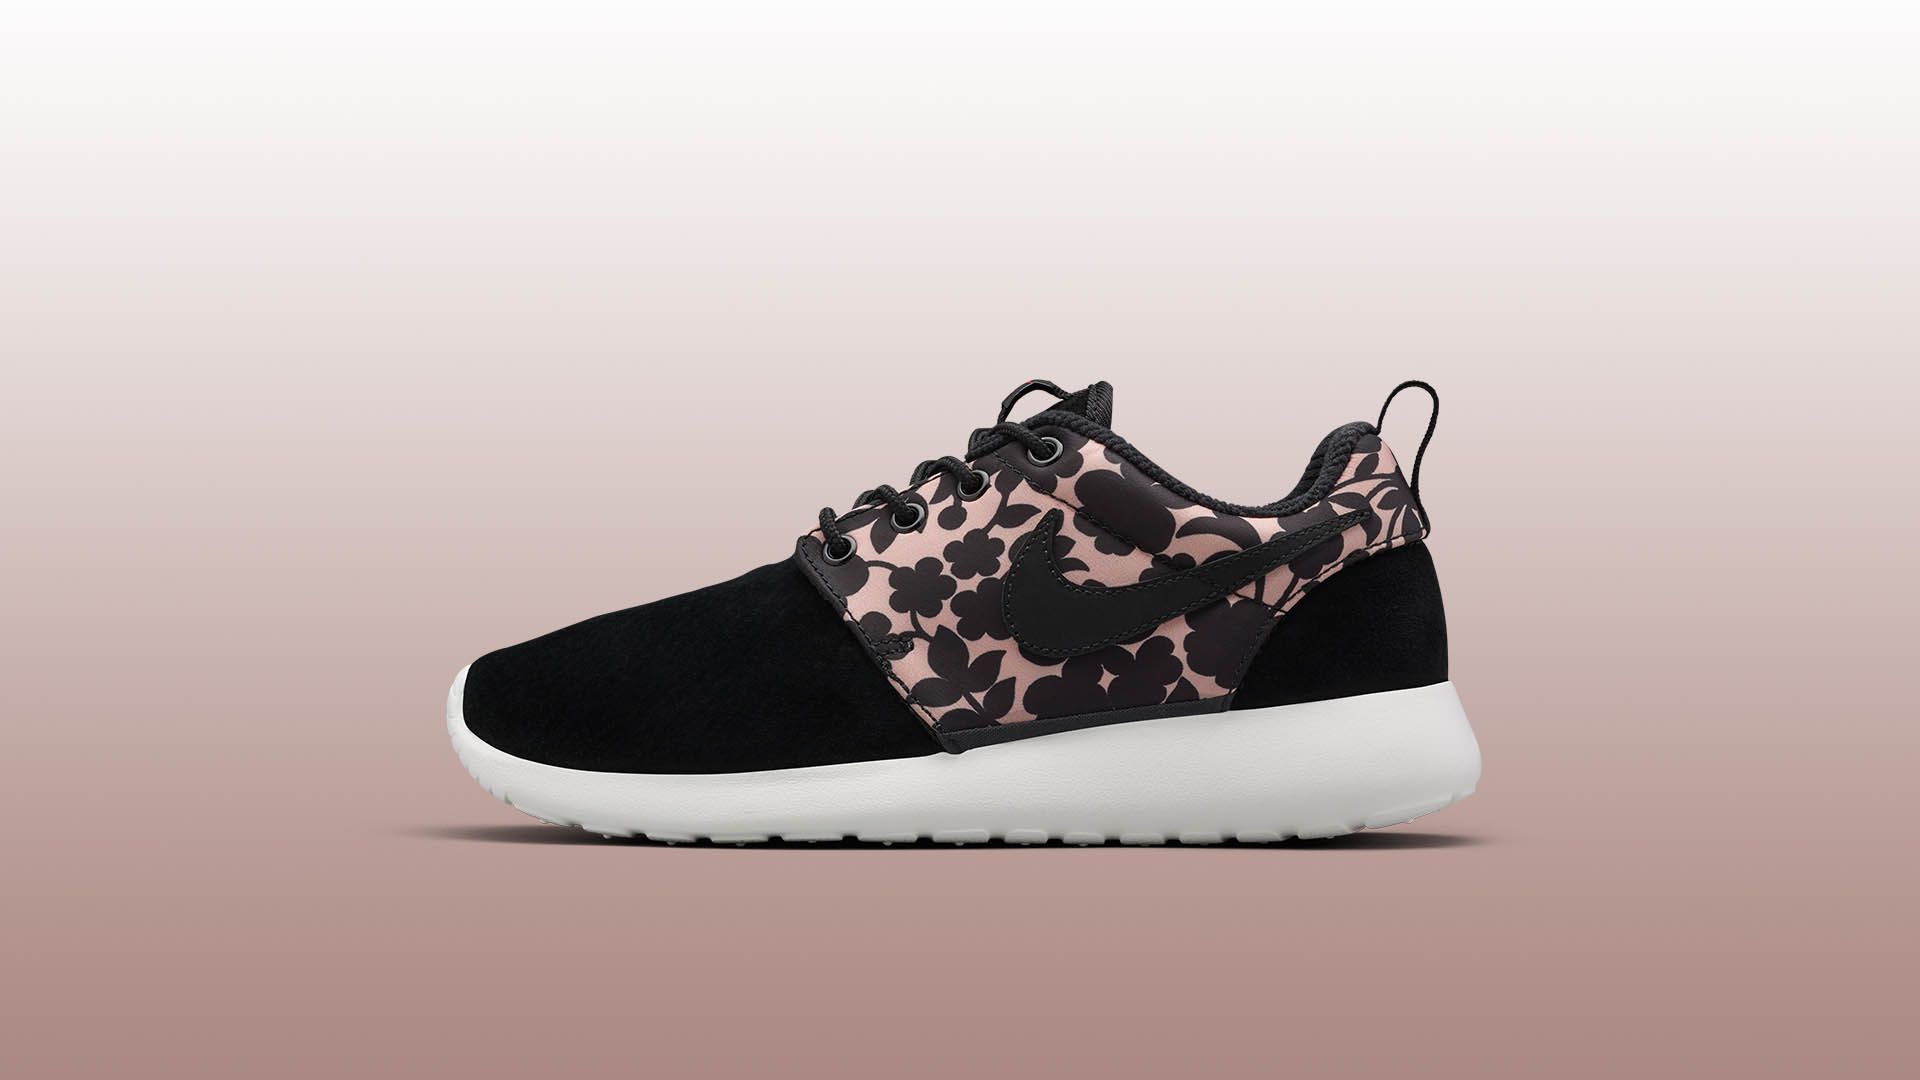 buy online 0b18c 522ef Liberty x Women's Nike Roshe One 'Cameo'. Nike+ SNKRS